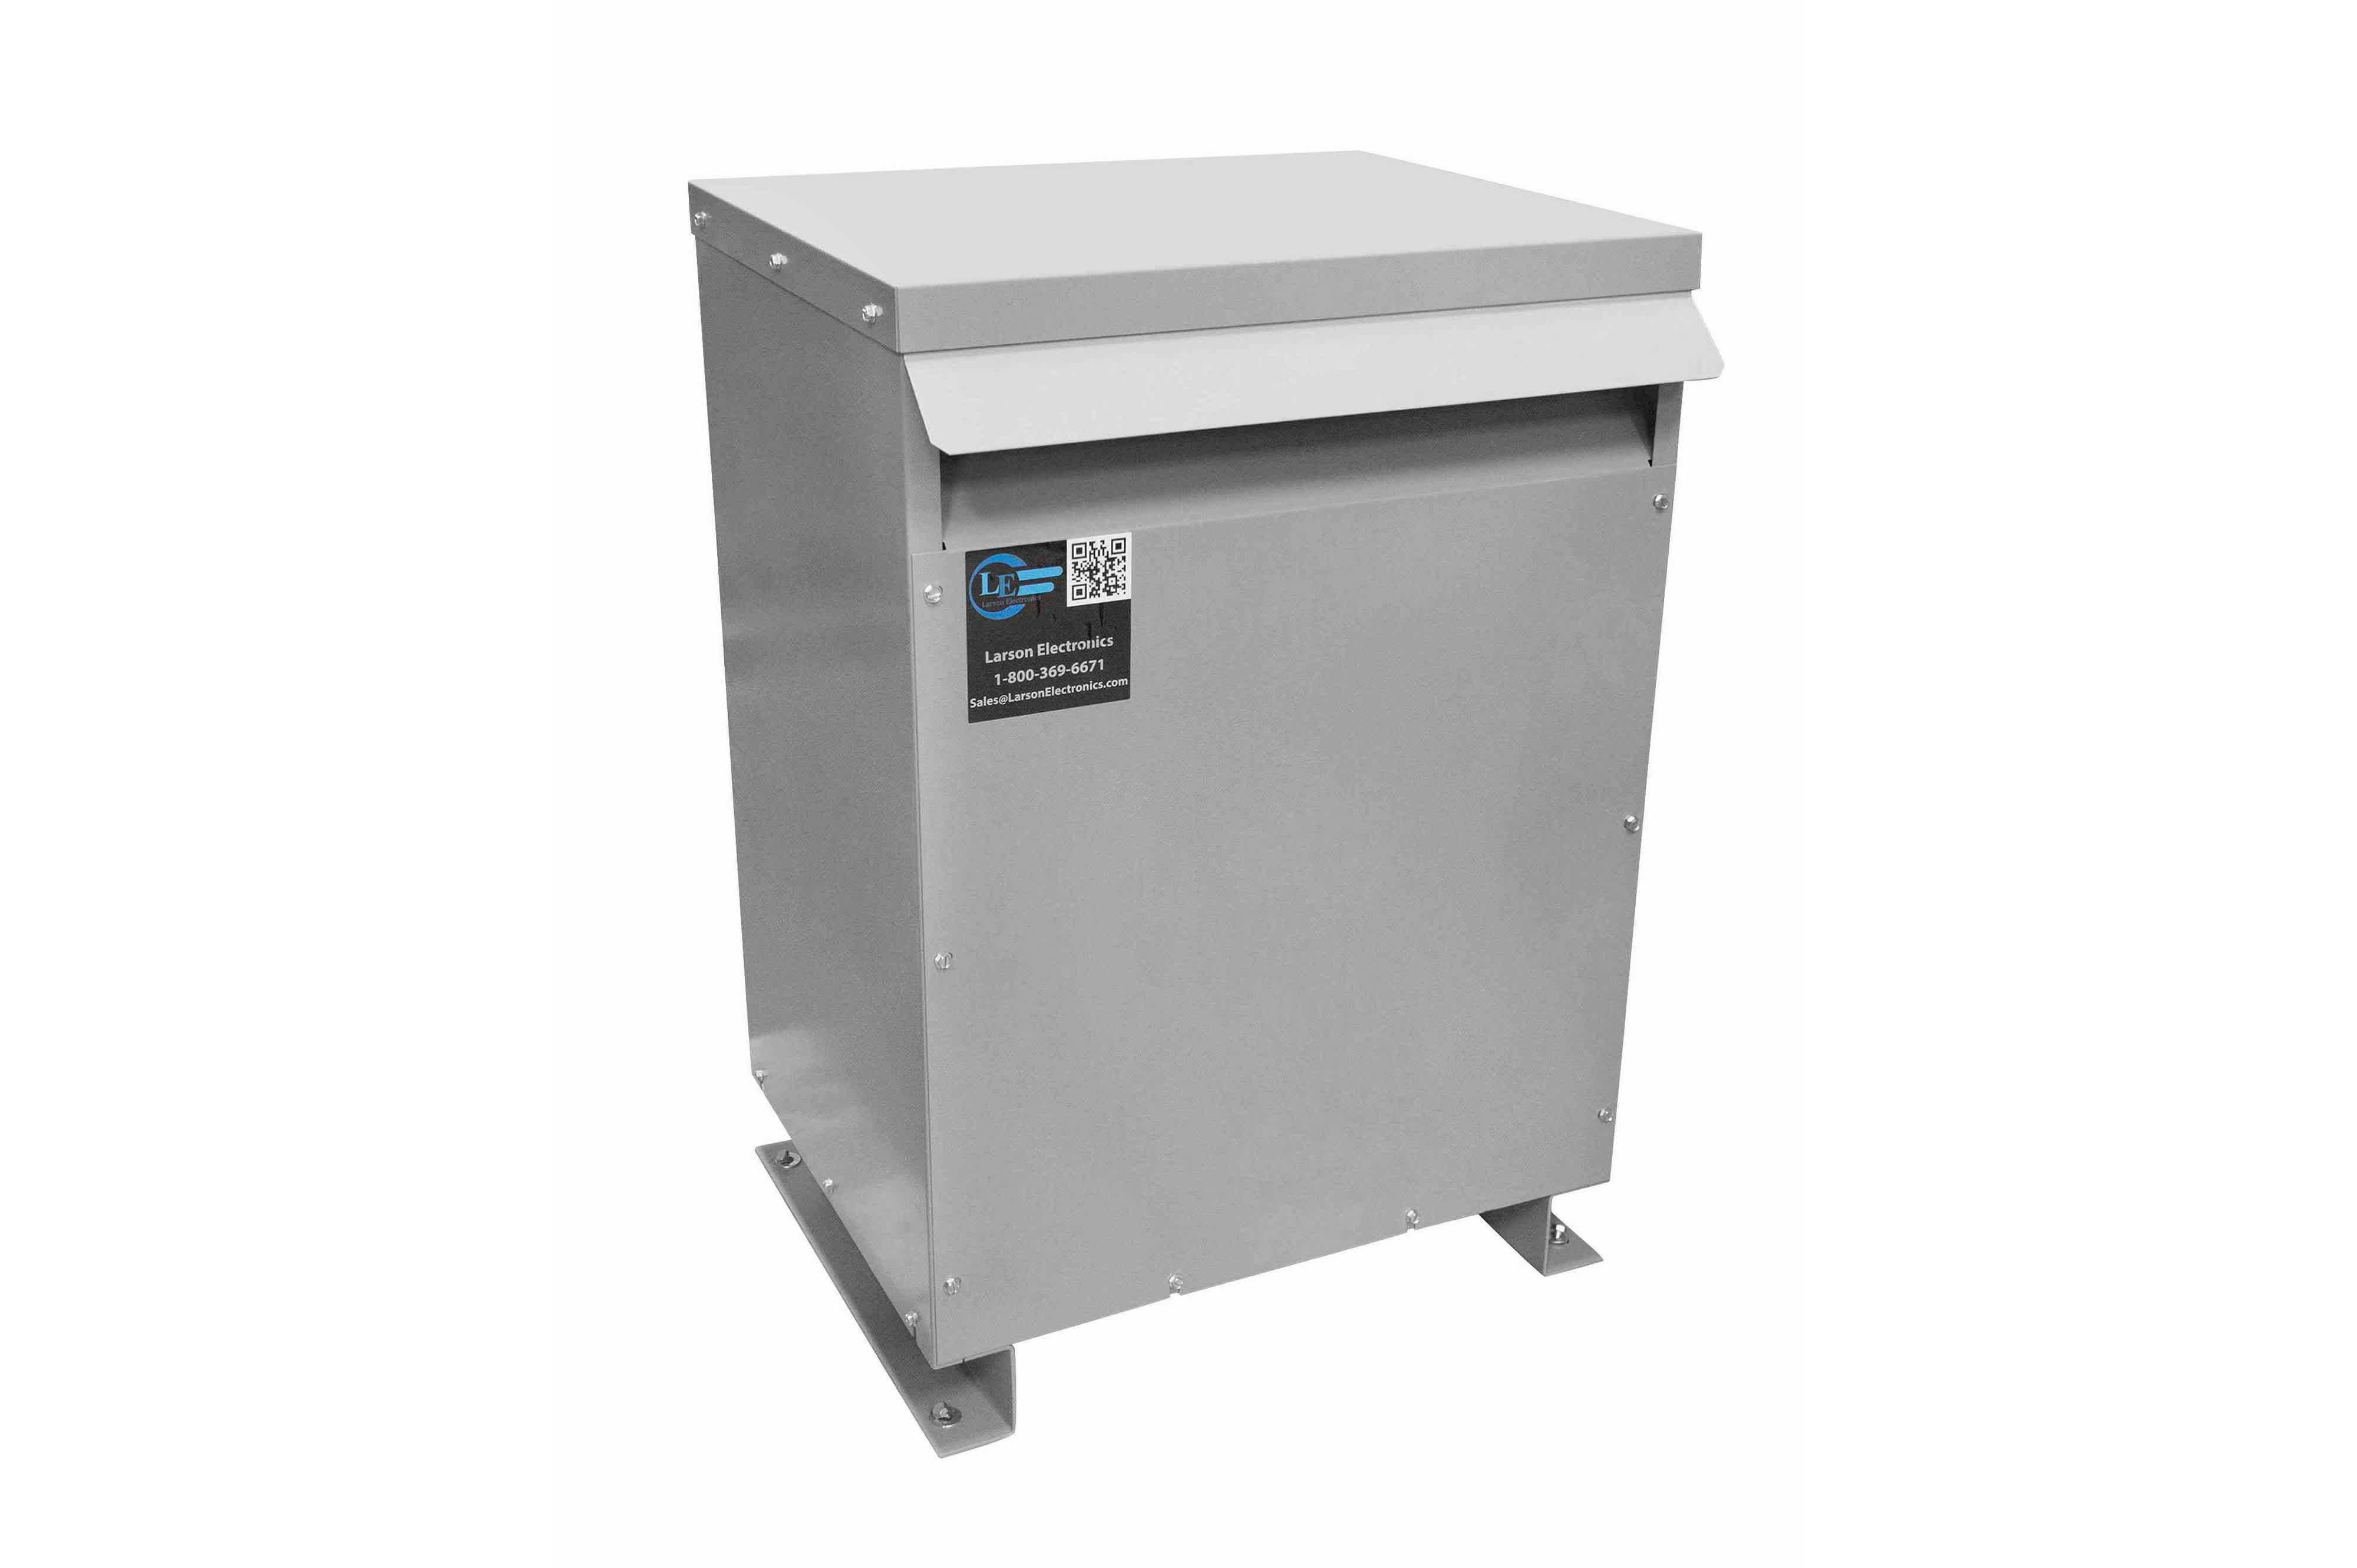 300 kVA 3PH DOE Transformer, 240V Delta Primary, 480Y/277 Wye-N Secondary, N3R, Ventilated, 60 Hz